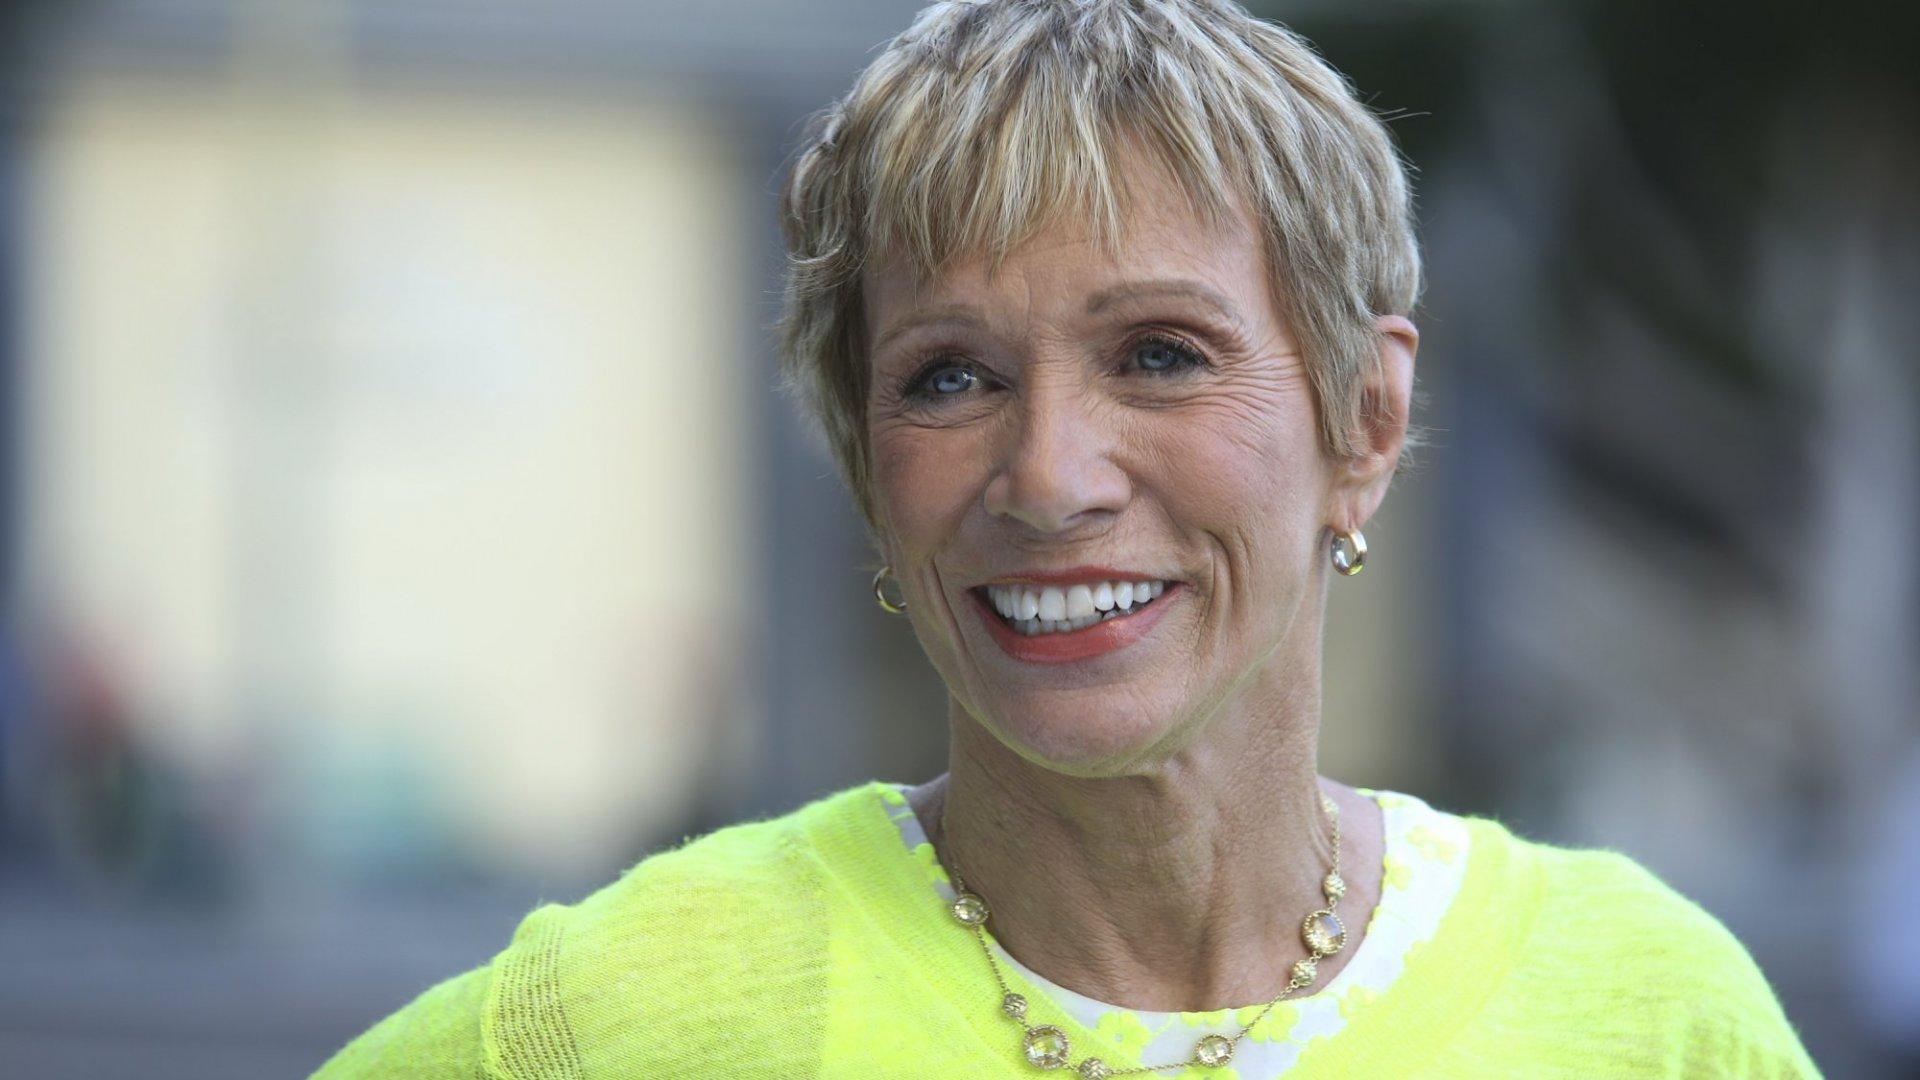 Barbara Corcoran's Go-To Book for Anyone Seeking Her Leadership or Business Advice